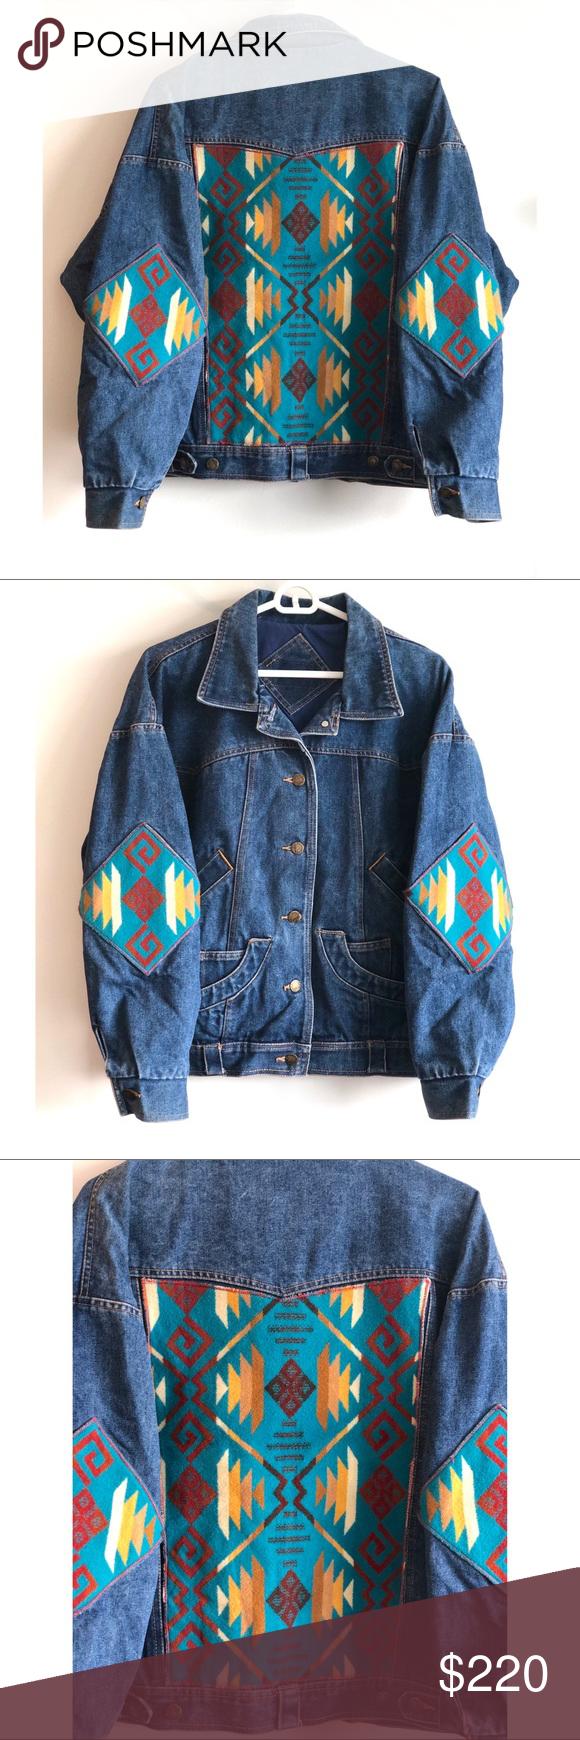 Pendleton Wool Vintage Denim Jean Jacket Size M Vintage Denim Vintage Denim Jeans Jean Jacket [ 1740 x 580 Pixel ]